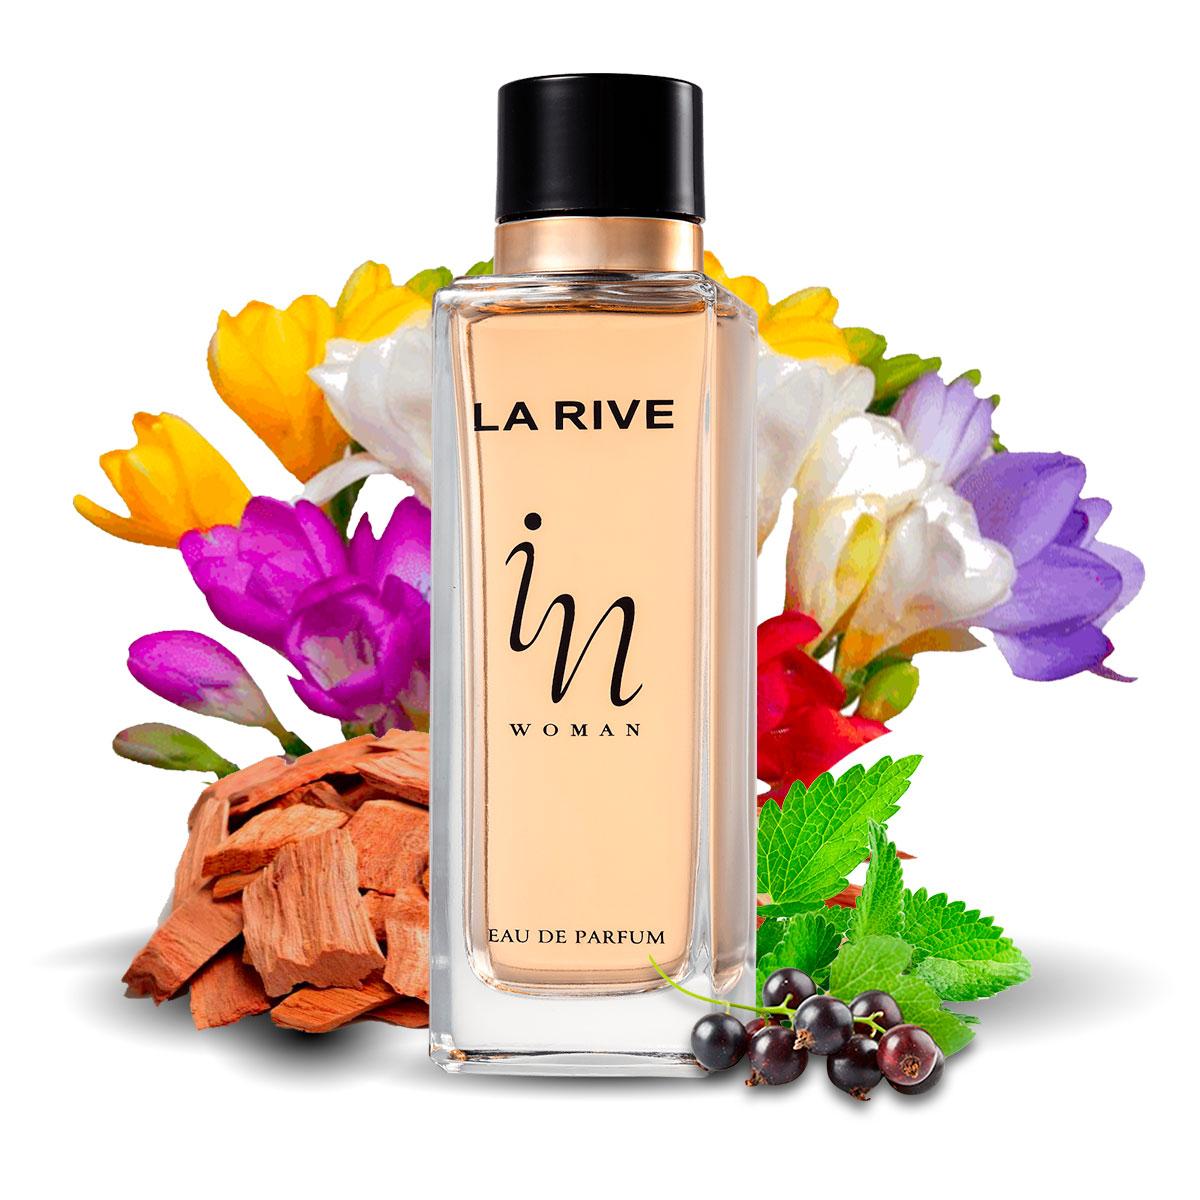 Kit 2 Perfumes Importados Extreme e In Woman La Rive  - Mercari Perfumes